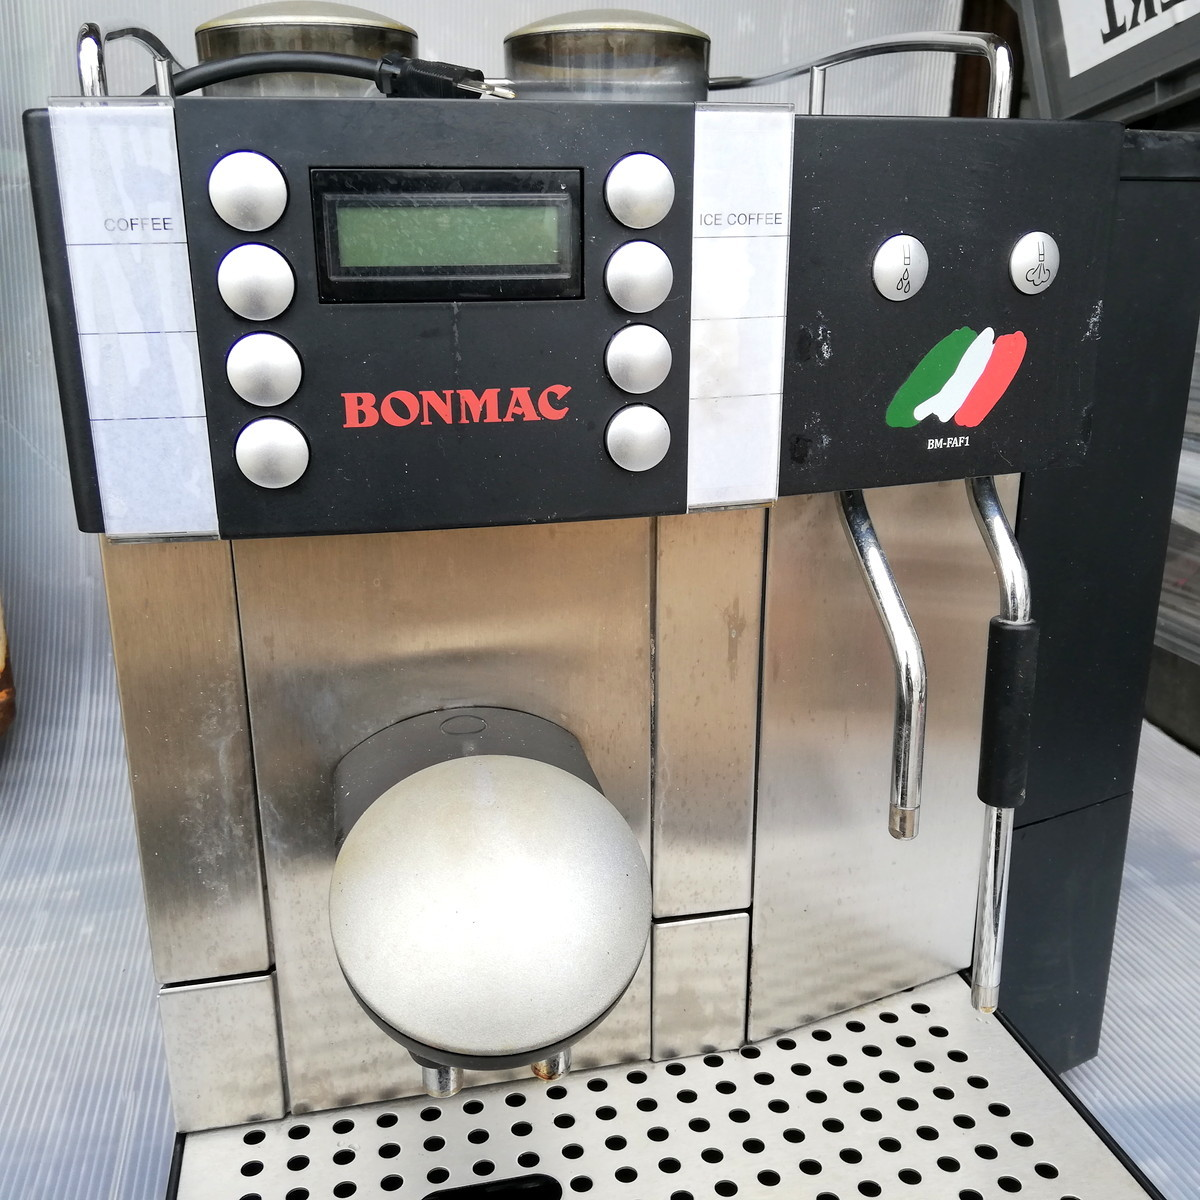 FR-1◆FRANKE フランケ Typ654 エスプレッソマシン 100V 通電確認済 コーヒーマシン / BONMAC BM-FAF1 ★引取歓迎(大阪)_画像4